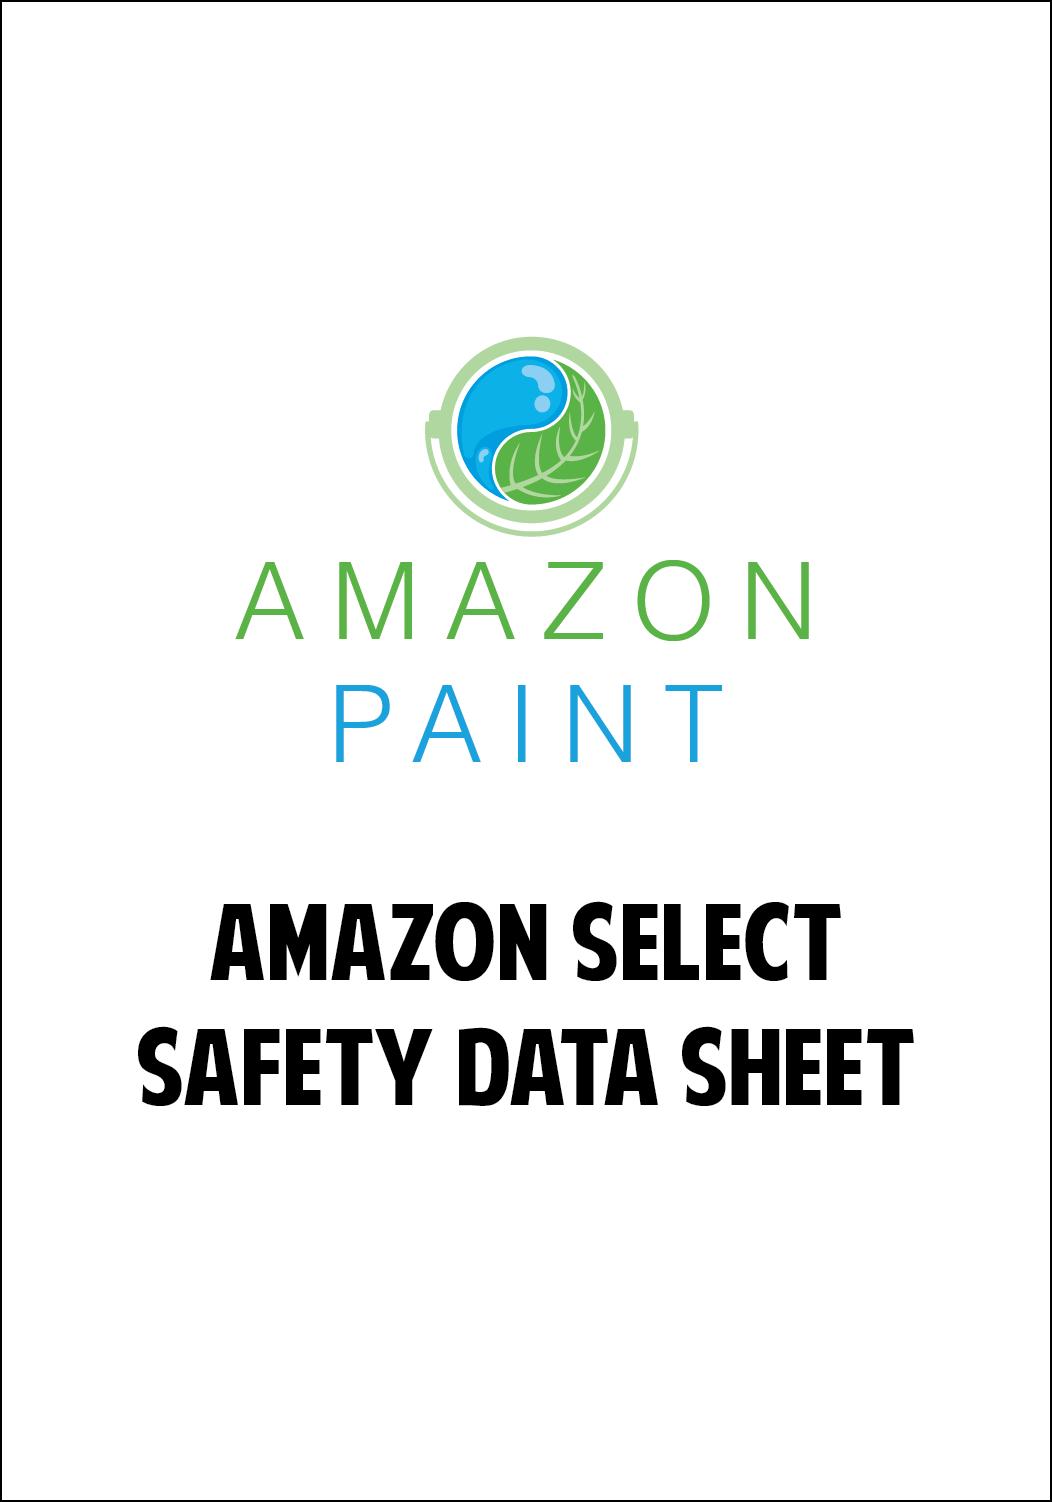 Amazon Select Safety Data Sheet